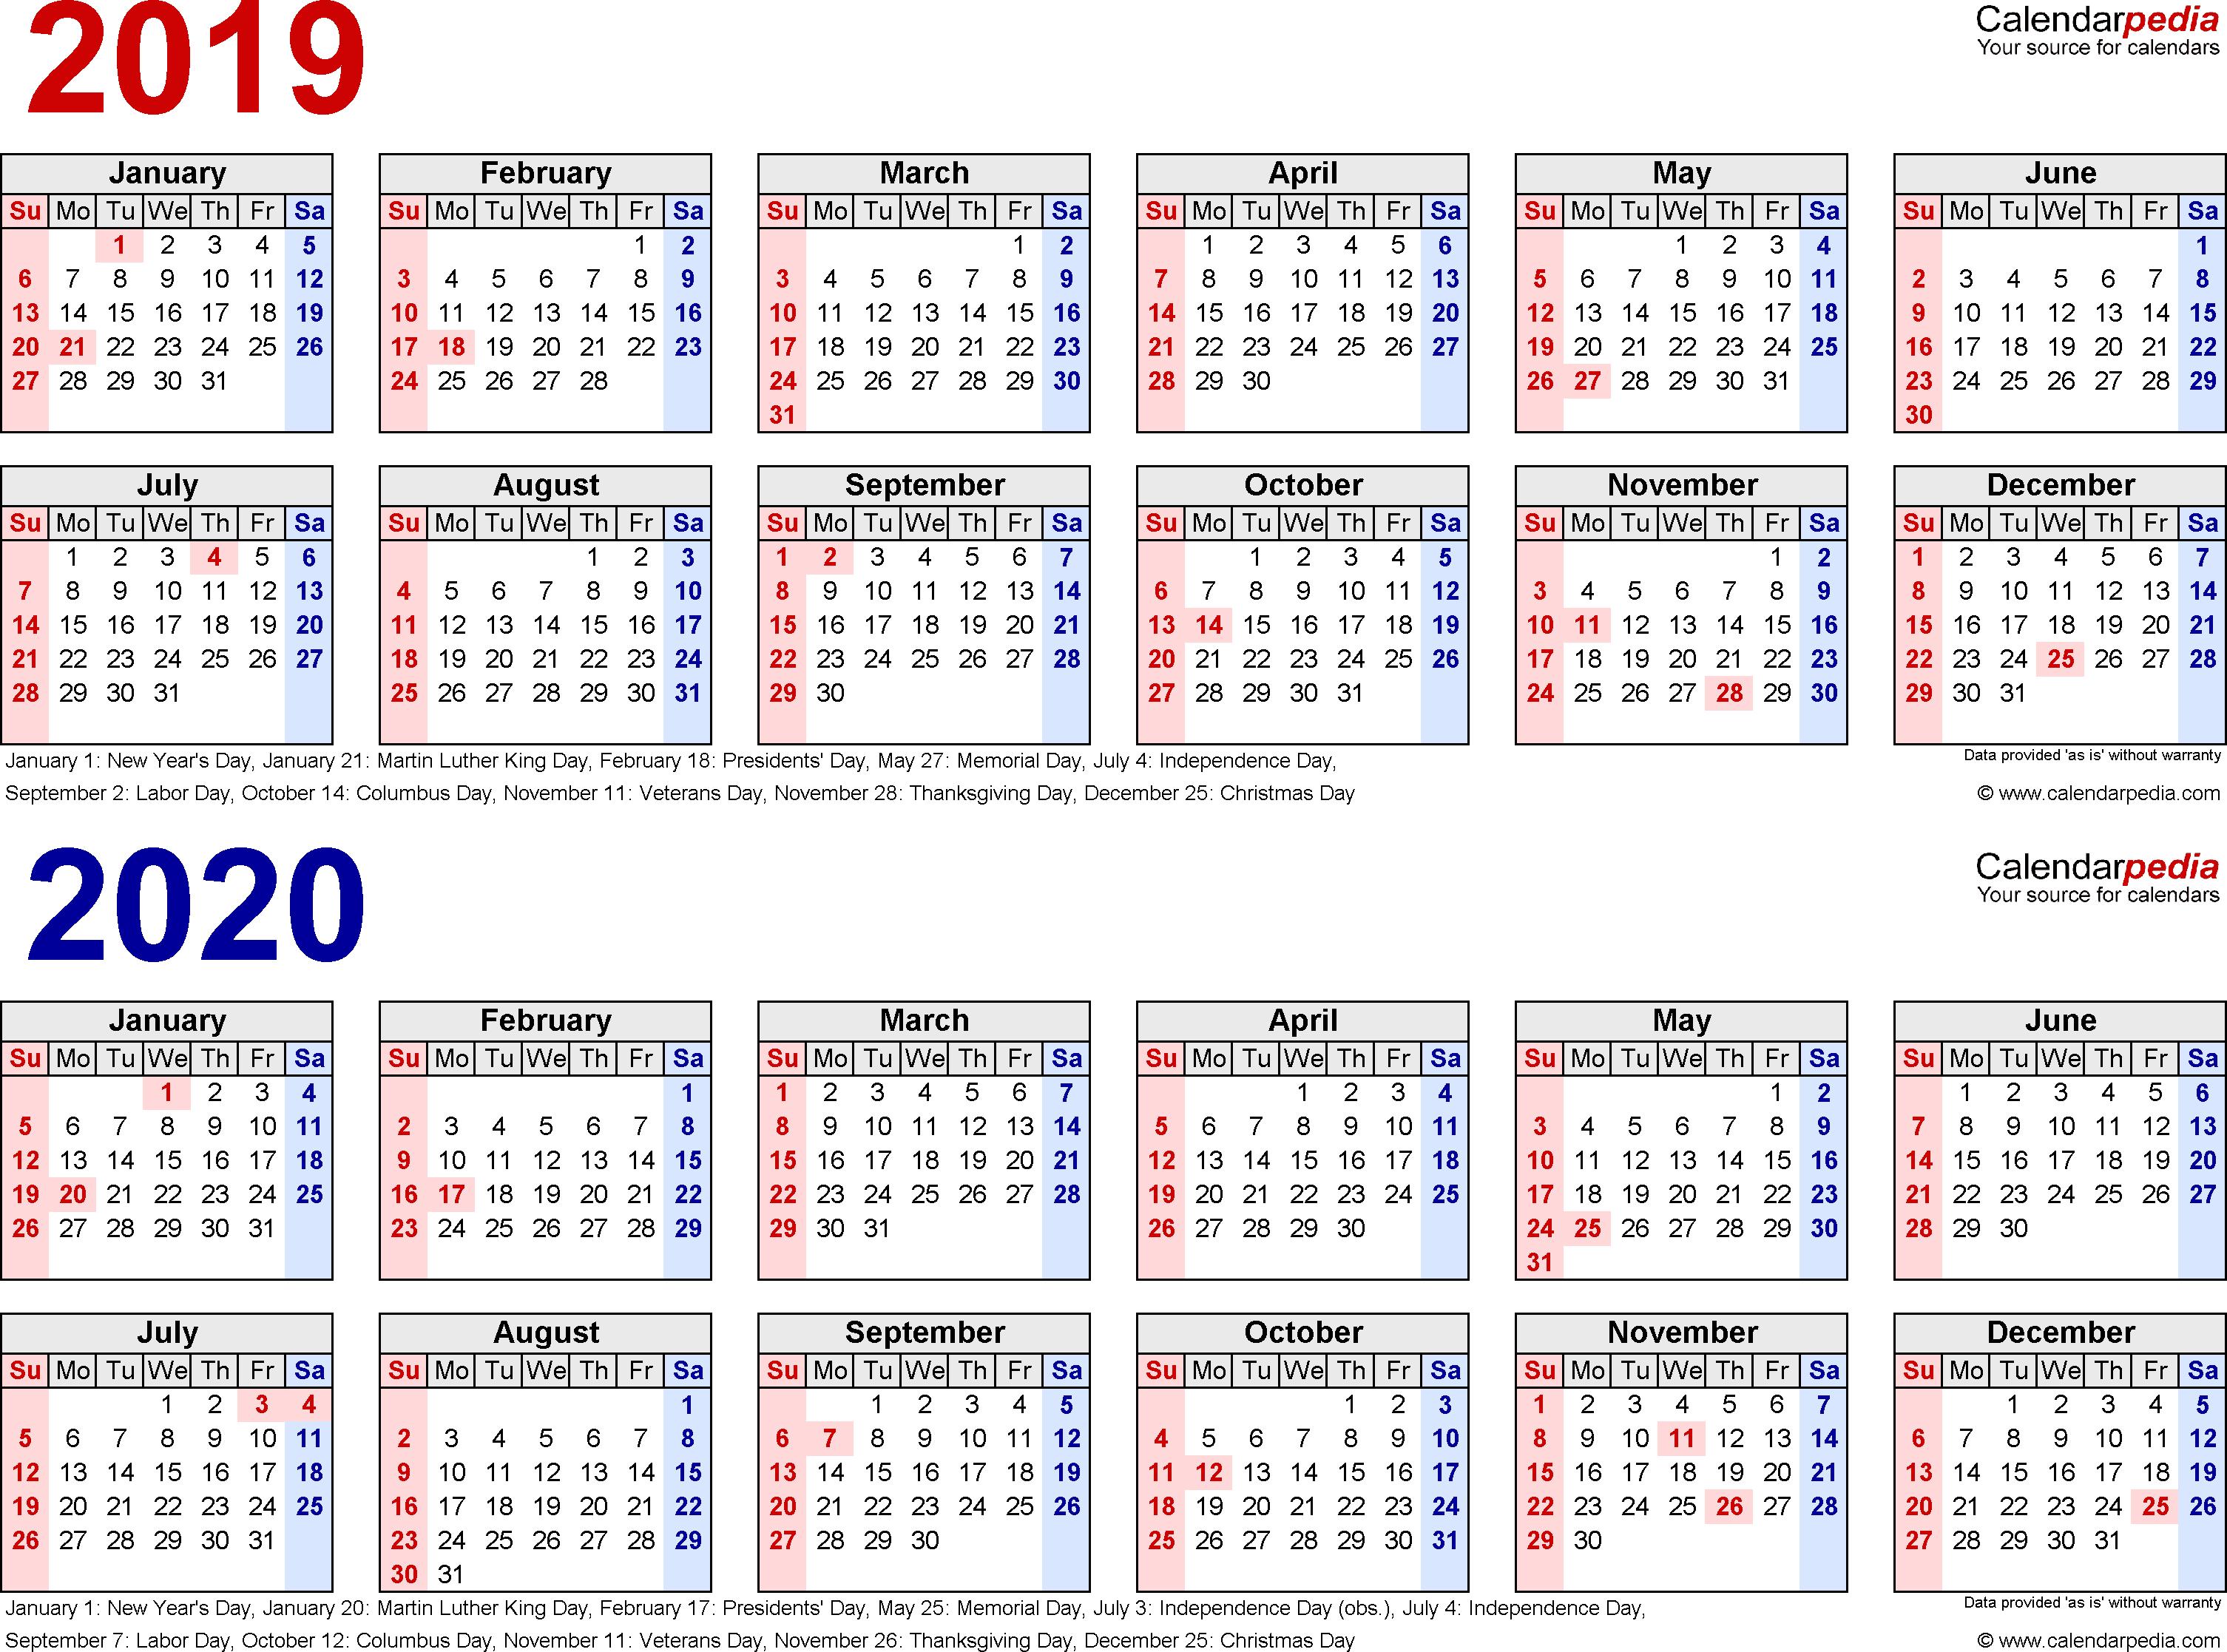 2019-2020 Calendar - Free Printable Two-Year Word Calendars regarding Printable Calendars July 2019 To June 2020